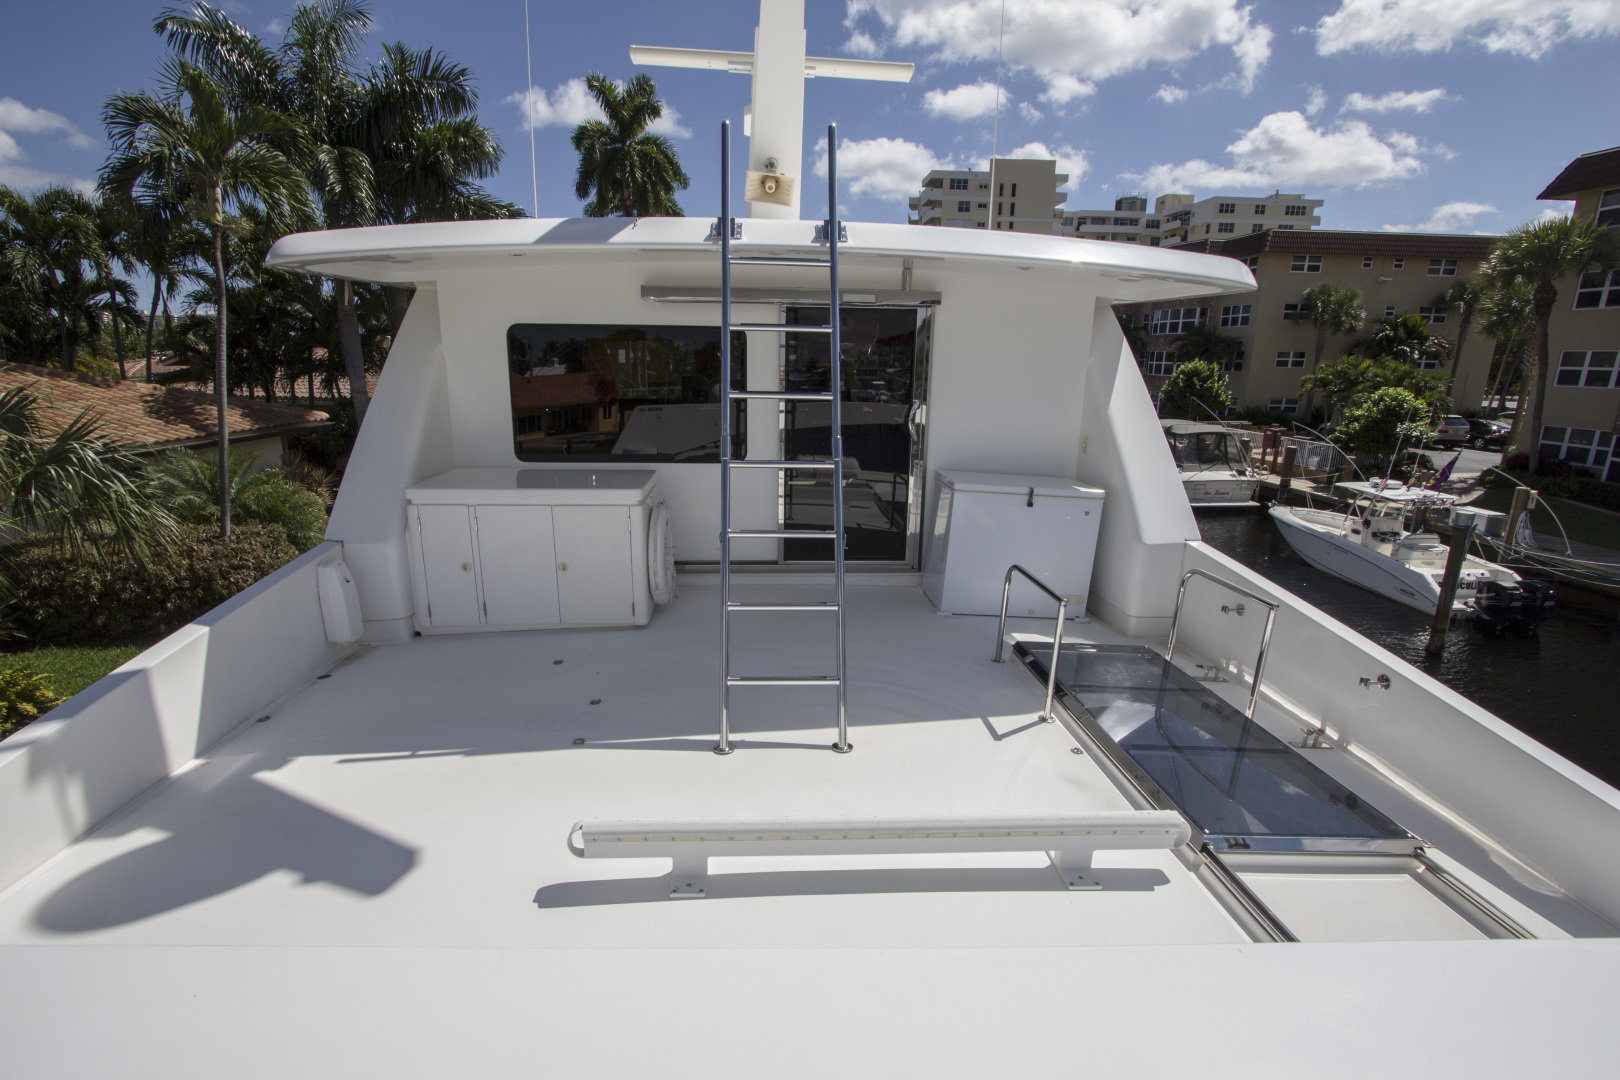 Hargrave-Skylounge 2003-KISMET Fort Lauderdale-Florida-United States-1415289   Thumbnail